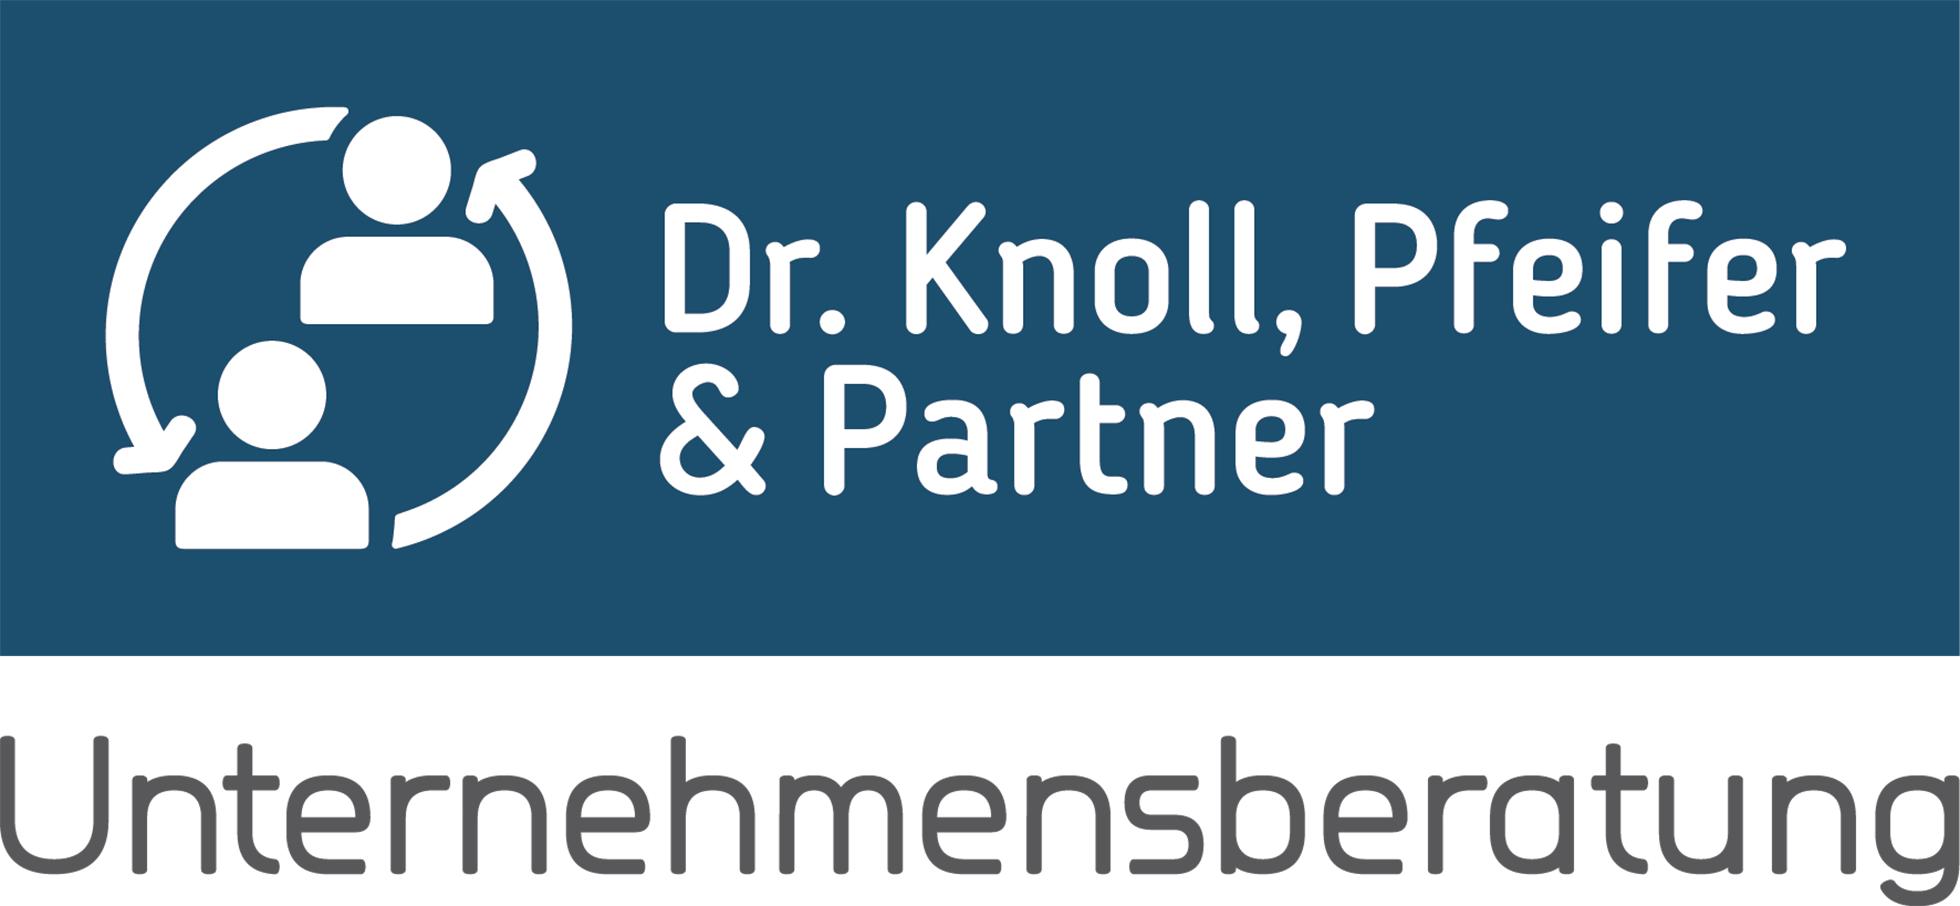 Dr. Knoll, Pfeifer & Partner Unternehmensberatung